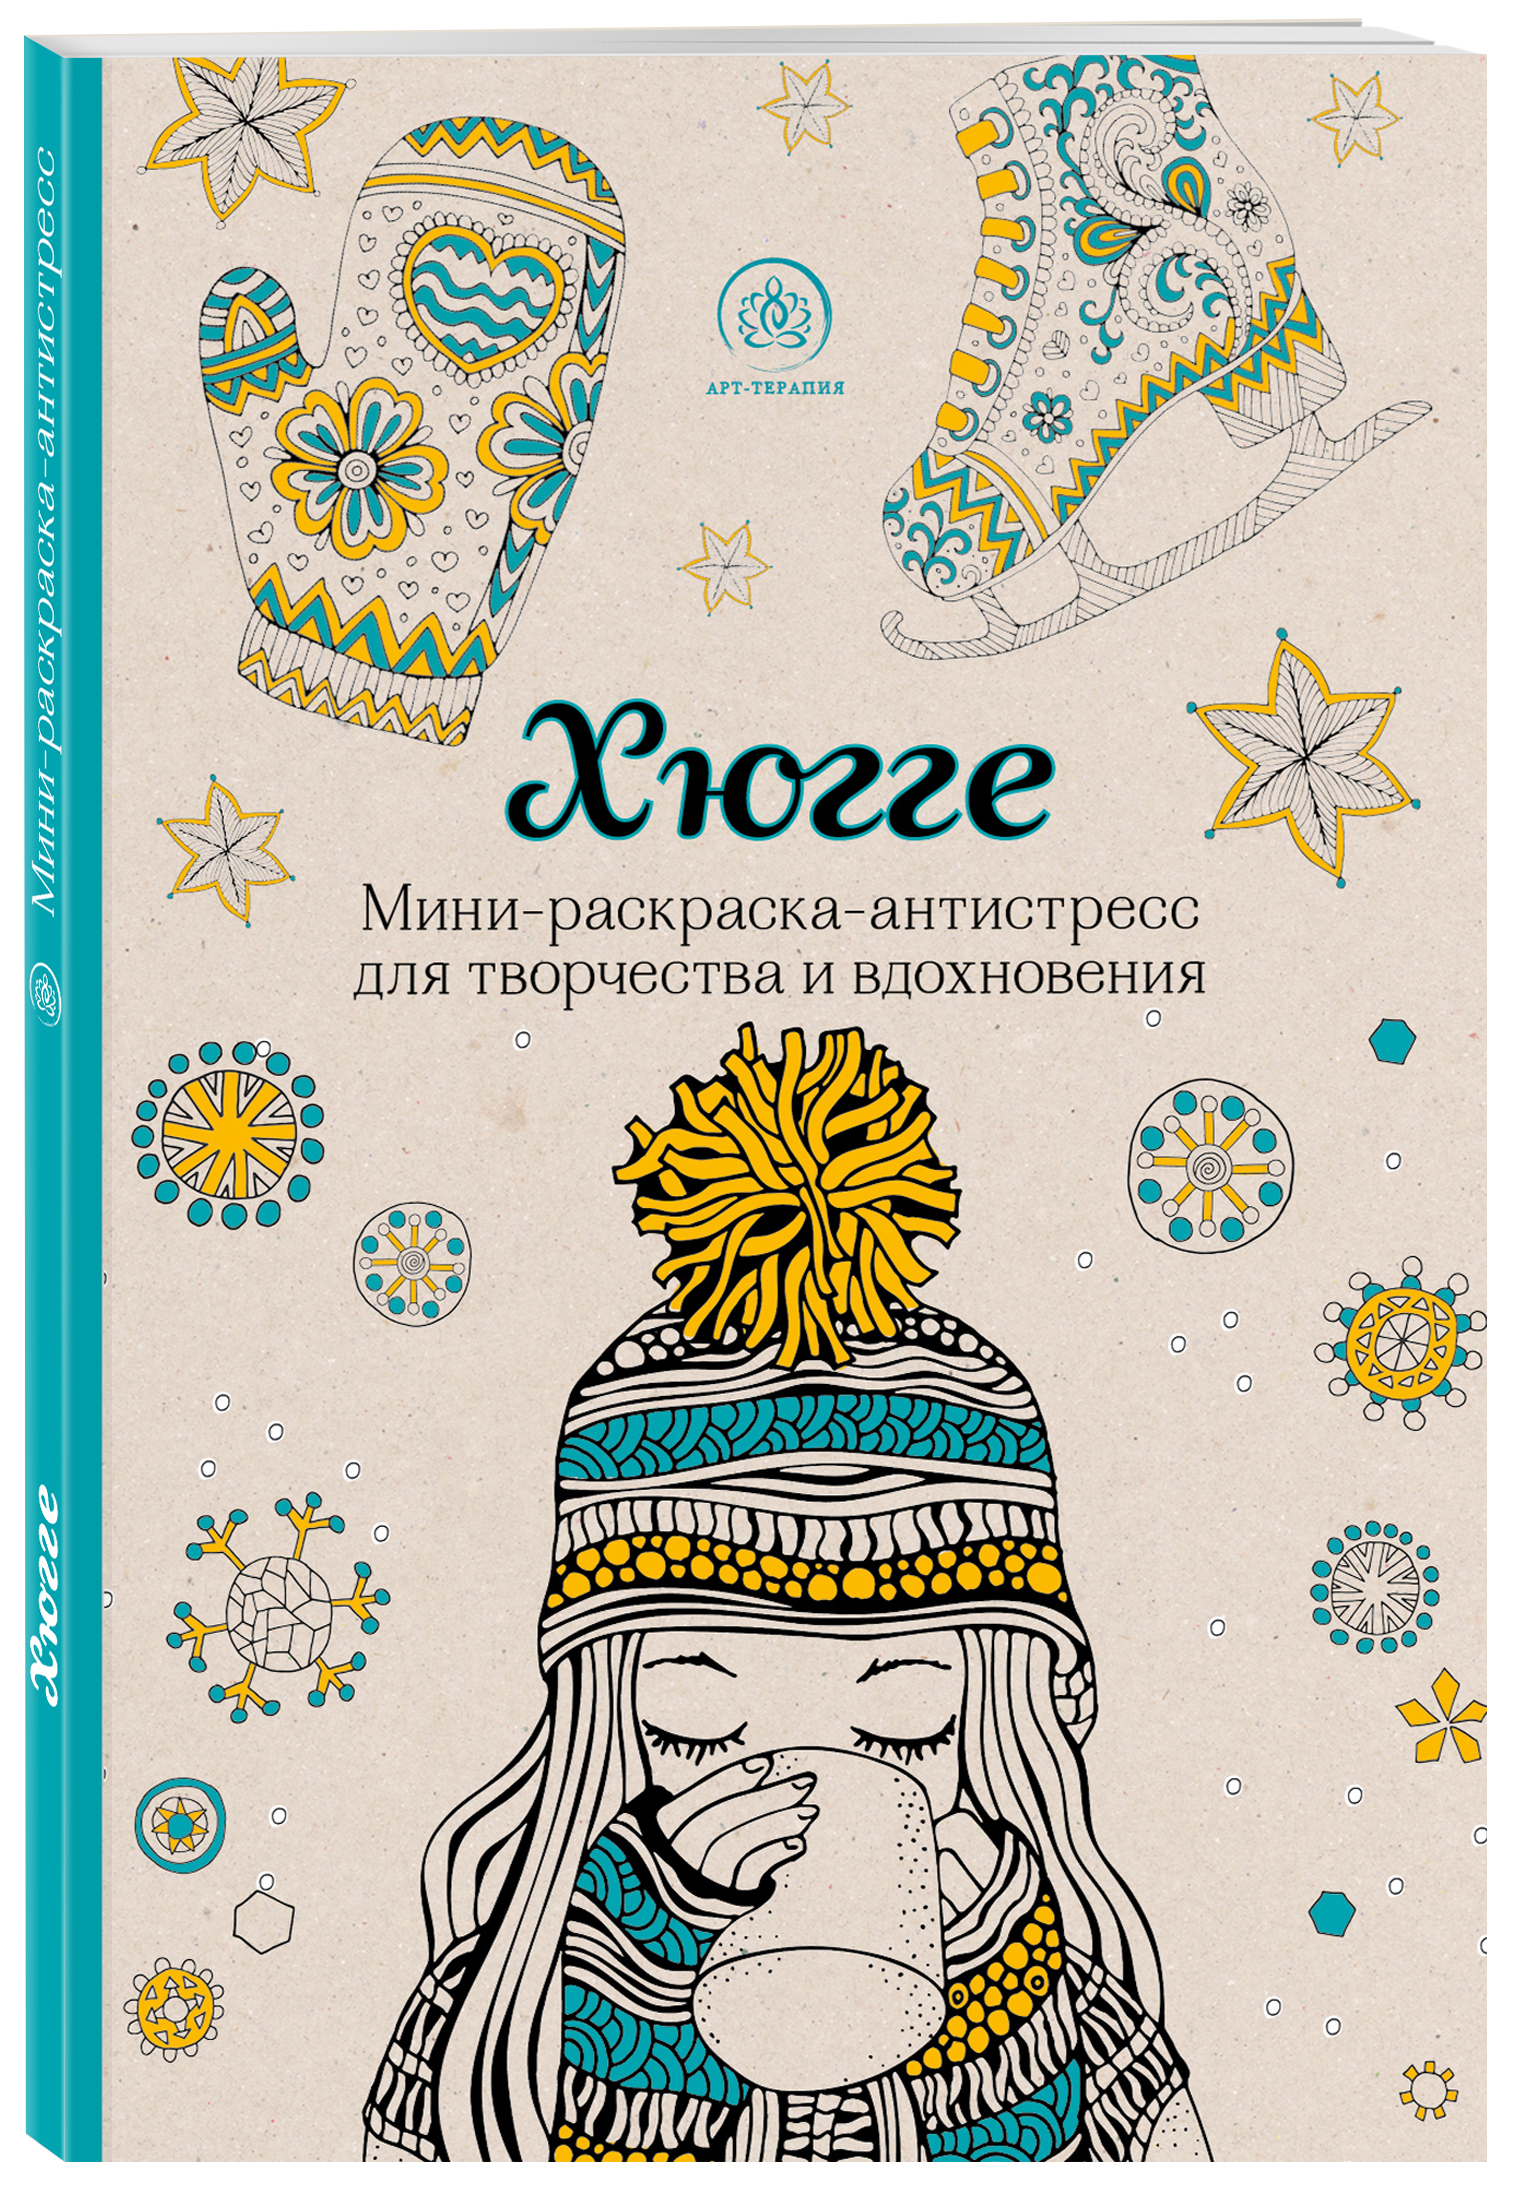 Хюгге. Мини-раскраска-антистресс для творчества и вдохновения раскраски эксмо радости раскраска антистресс для творчества и вдохновения